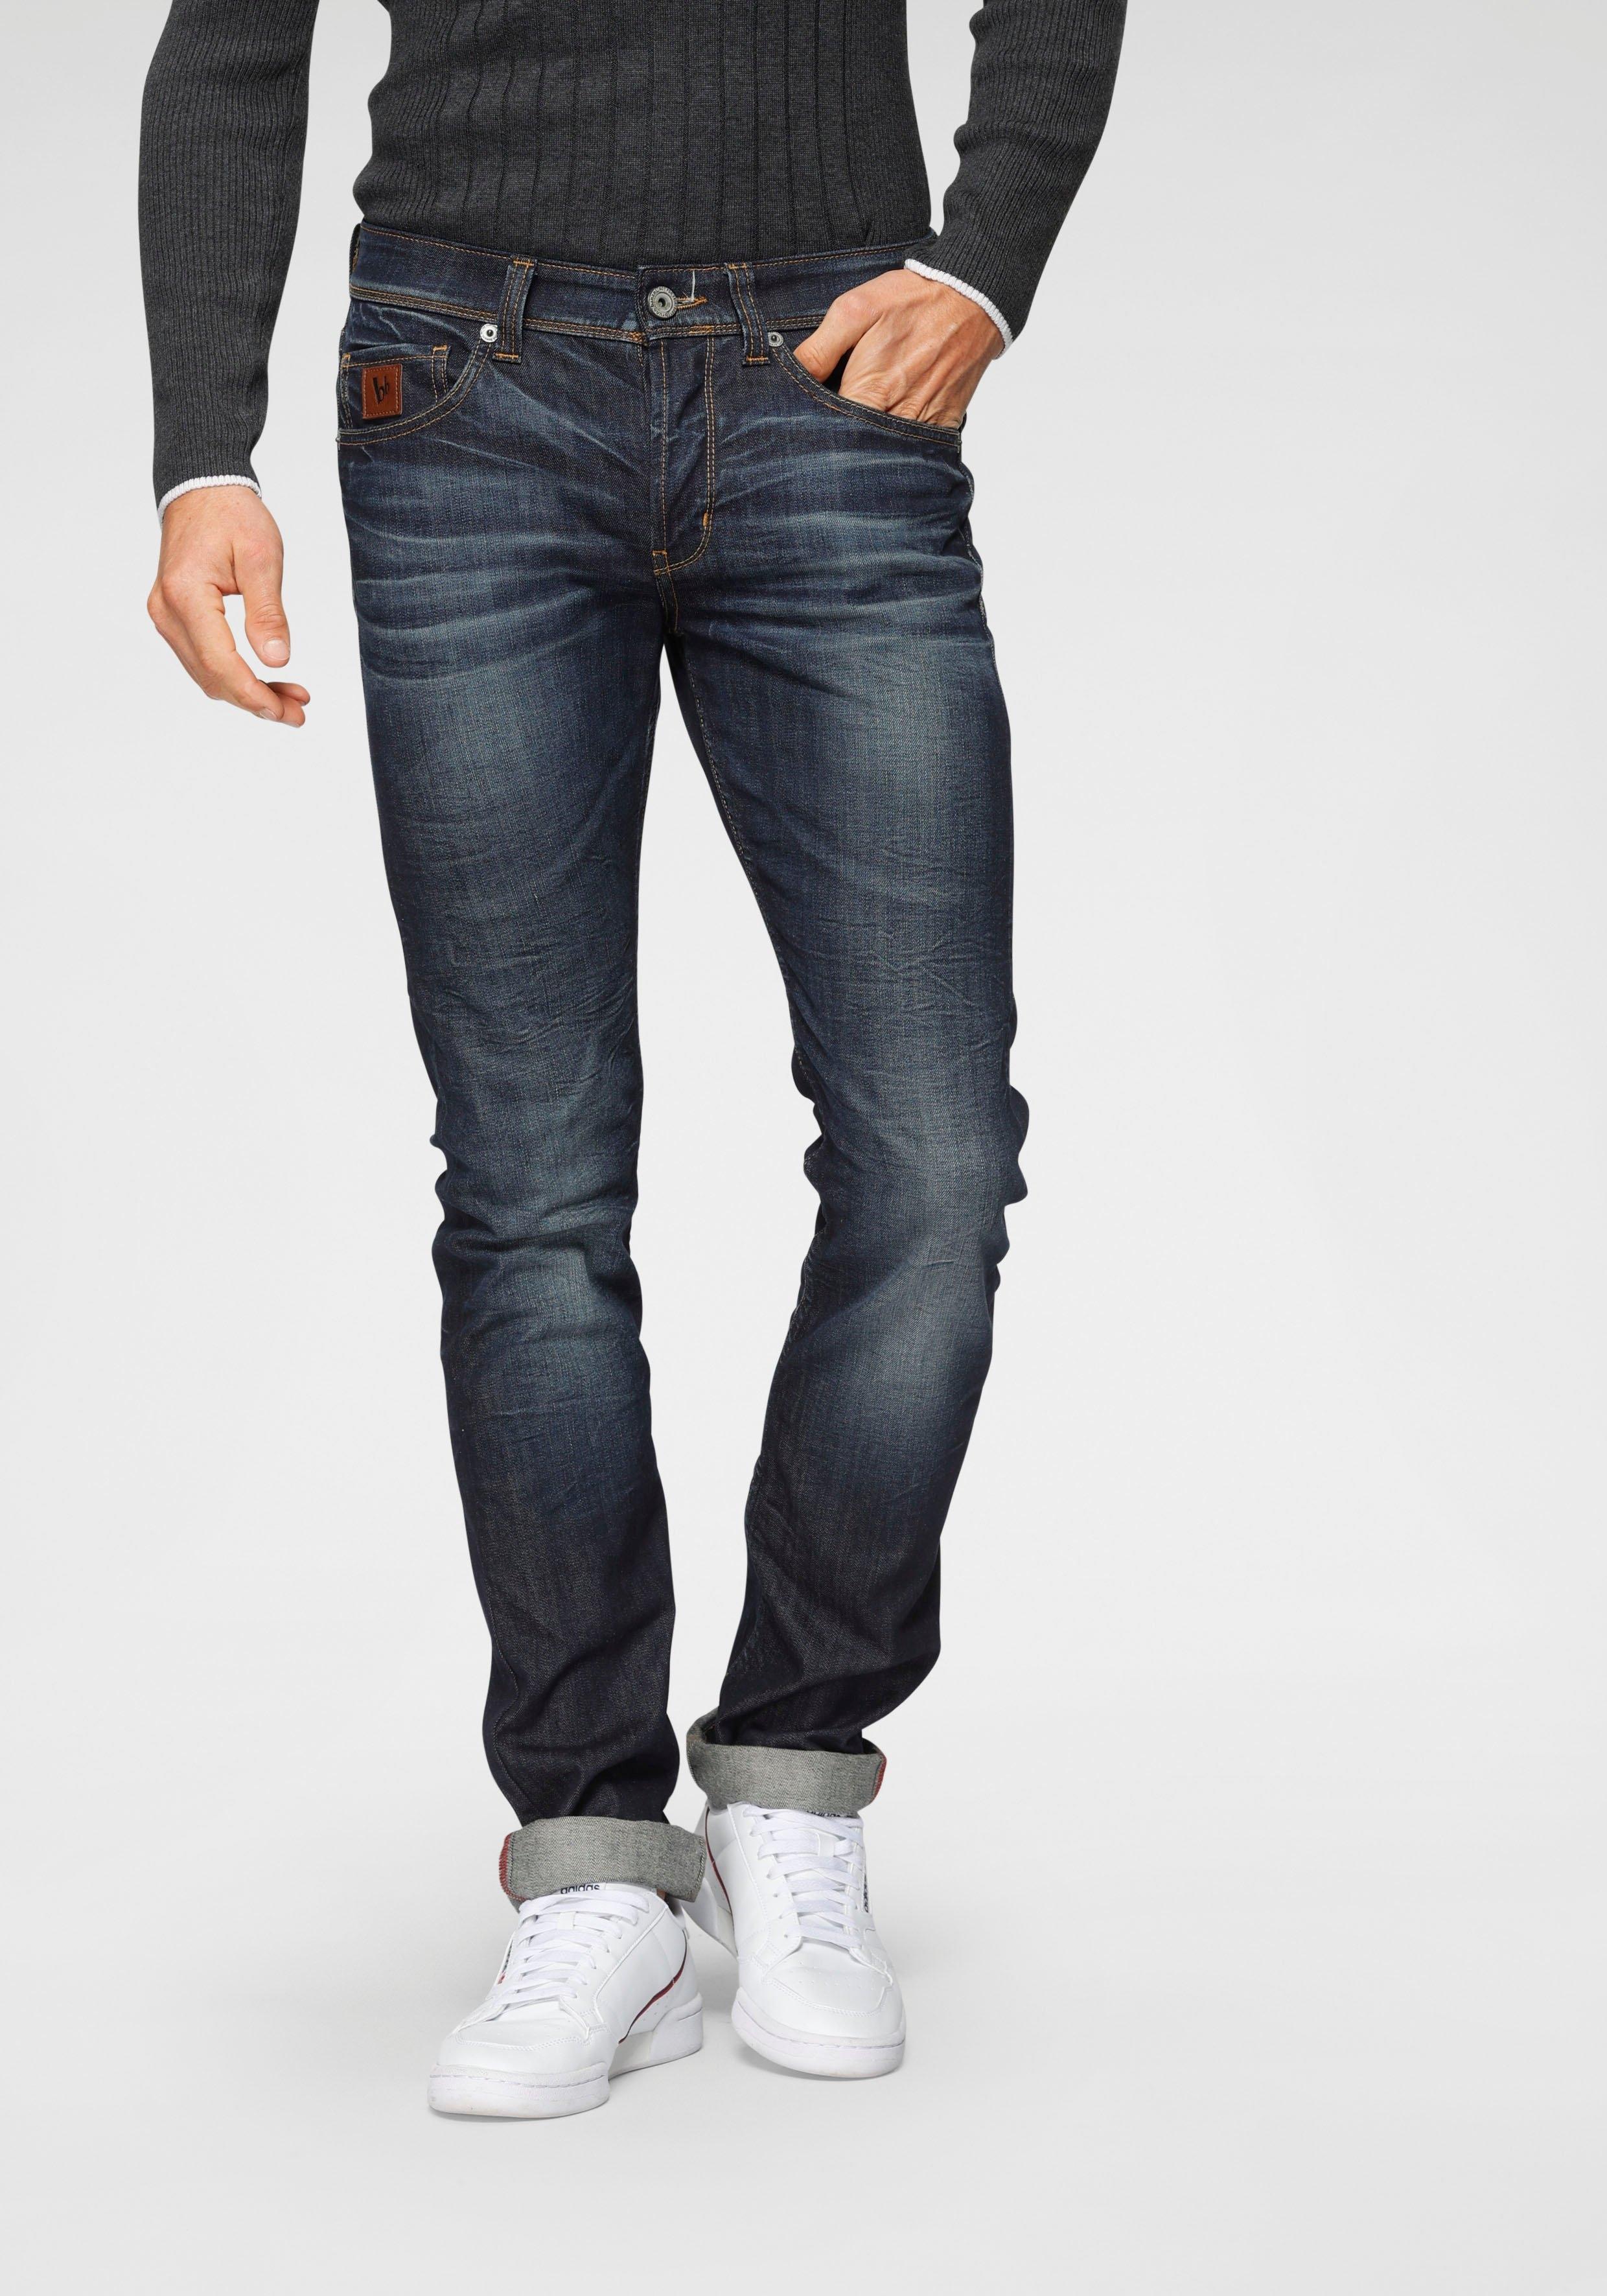 Bruno Banani slim fit jeans Jimmy (stretch) nu online kopen bij OTTO